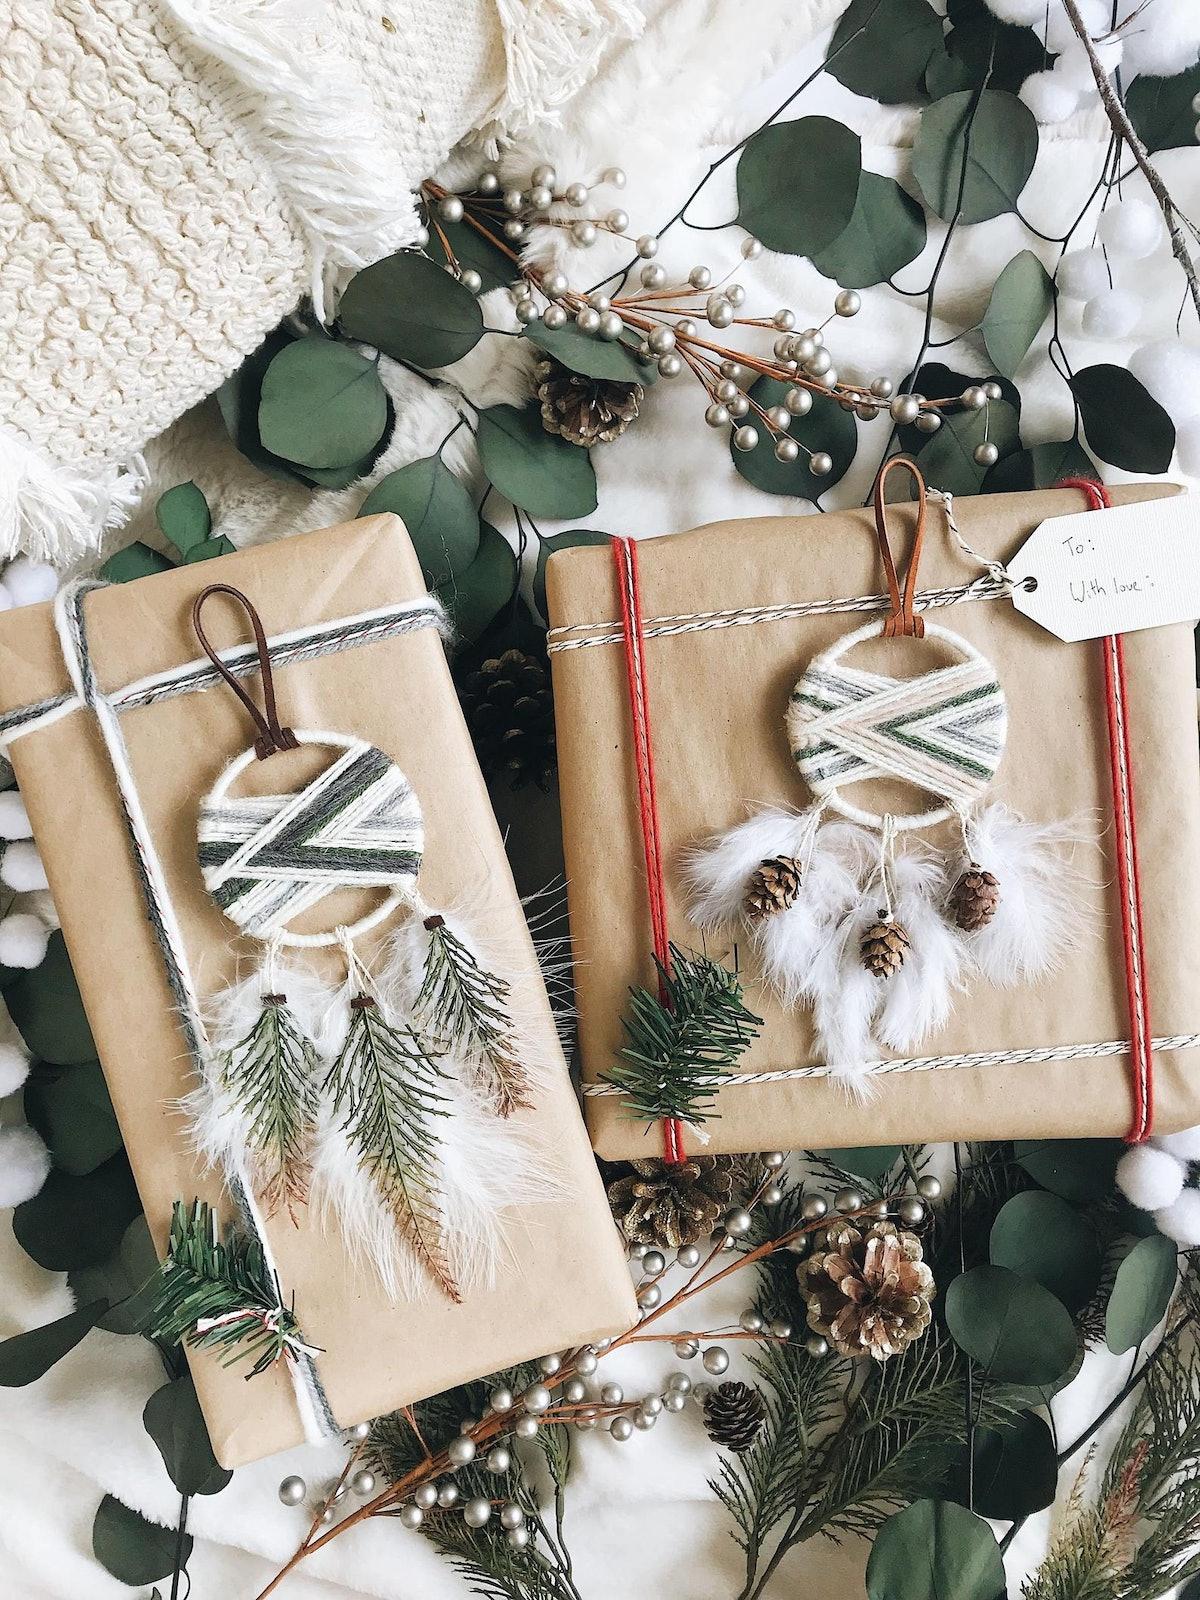 Winter Cabin Dream Catcher Christmas Ornaments — Set of 2